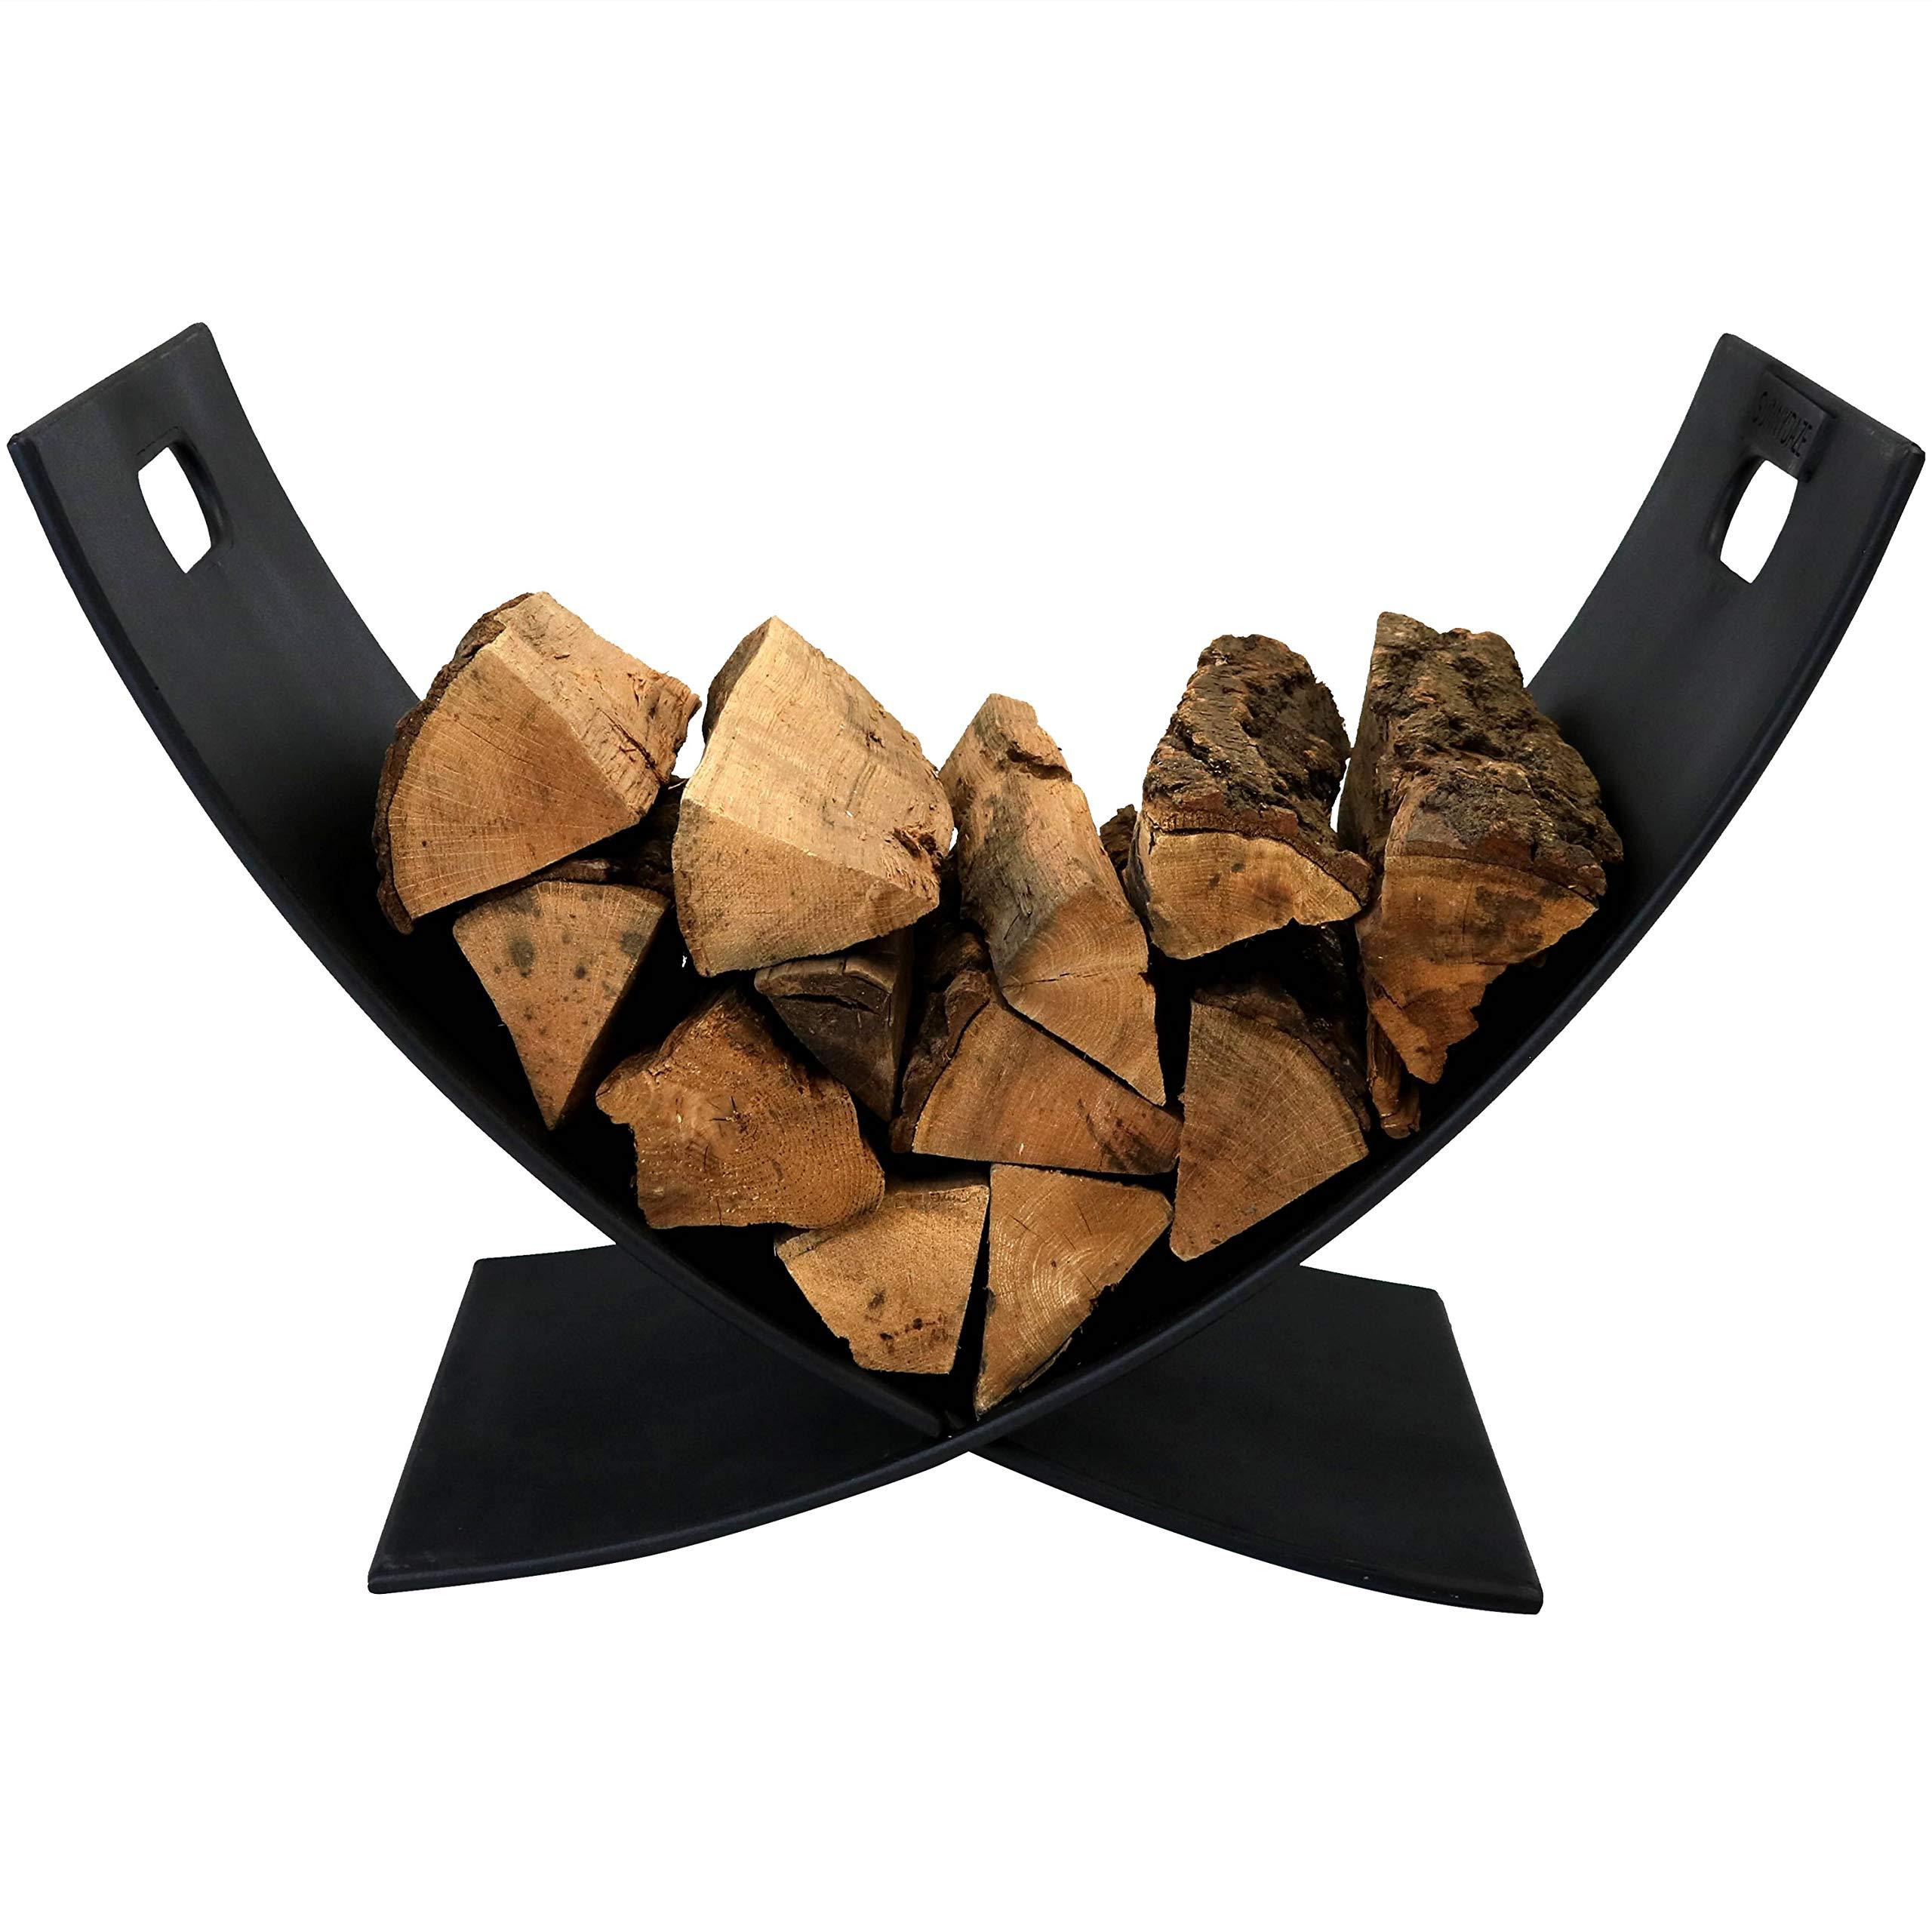 Sunnydaze 30 Inch Firewood Metal Log Rack - Indoor/Outdoor Heavy Duty Black Powder Coated Steel Wood and Kindling Stacker Storage Holder - Fireplace Accessory by Sunnydaze Decor